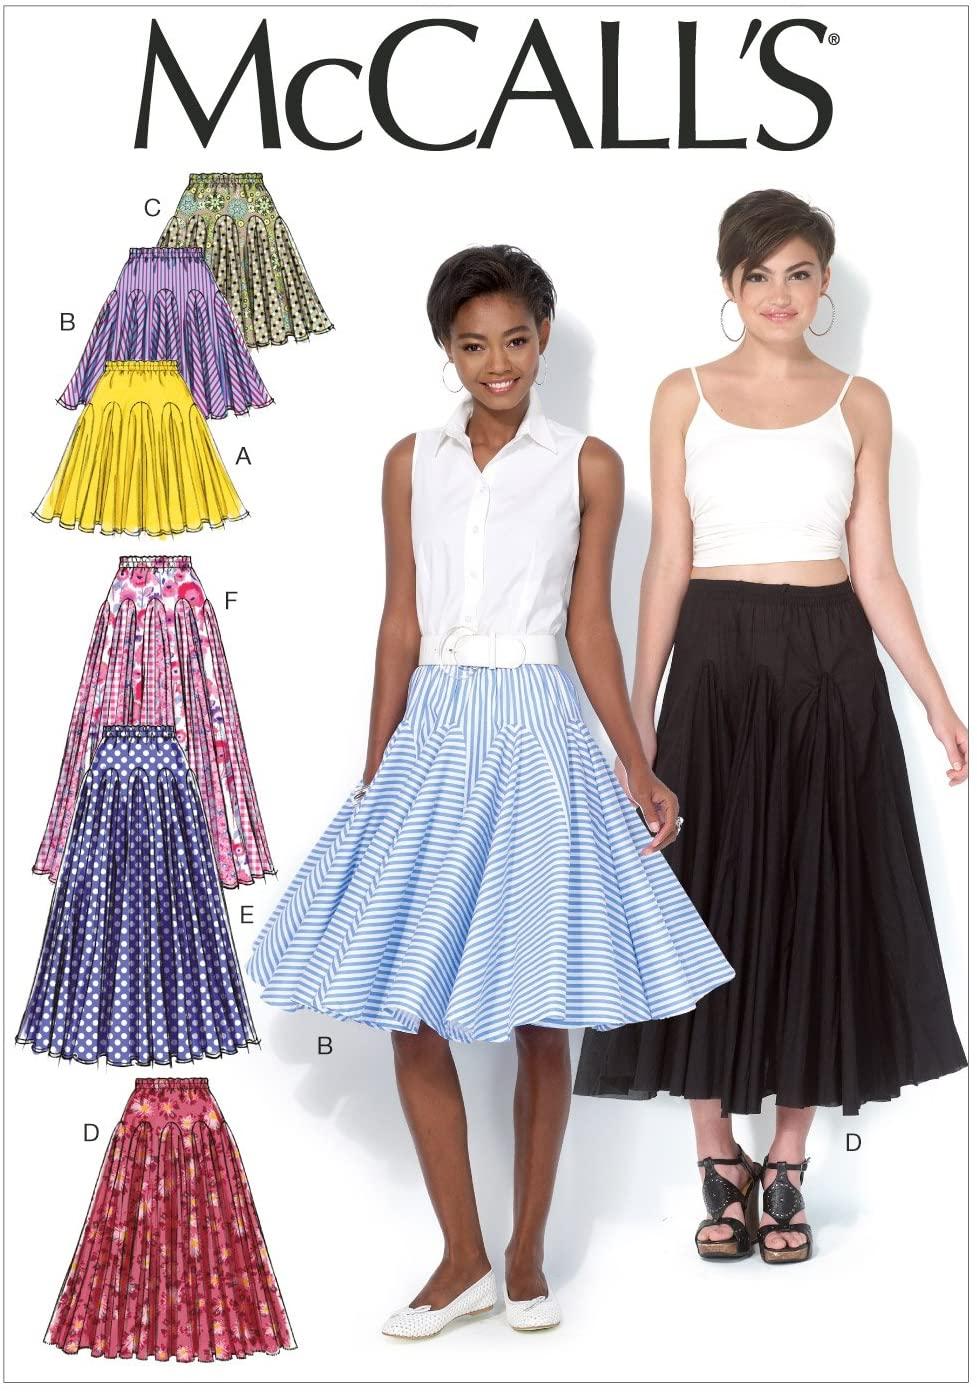 McCall Pattern Company M7097 Misses' Skirts, Size E5